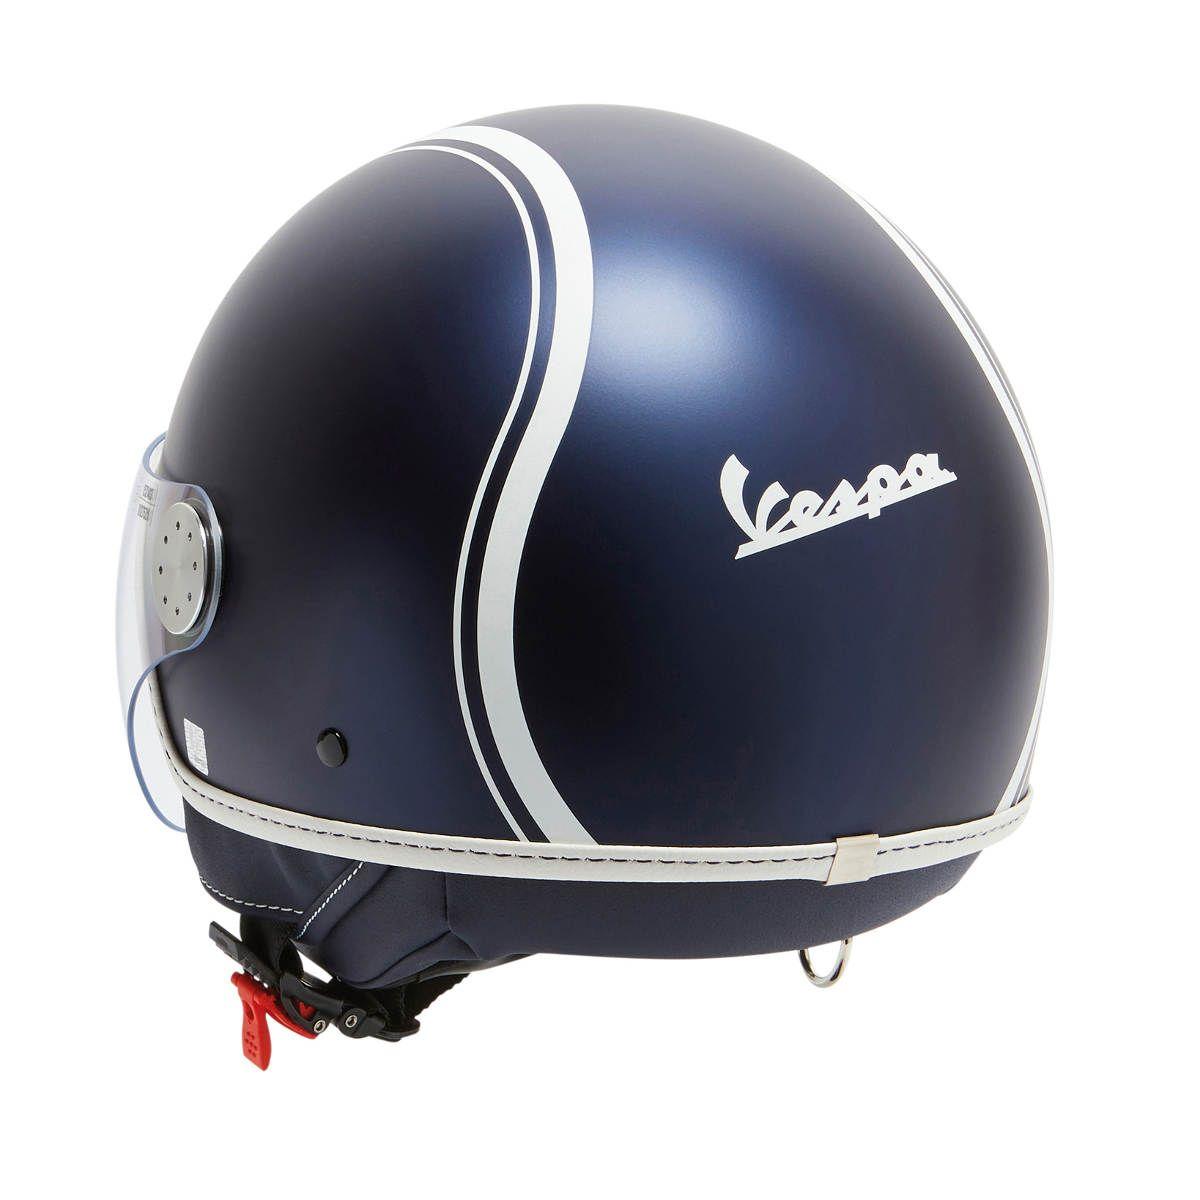 9a8fe45aeb7a6 New Vespa Yacht Club and Double Black Special Edition Helmets - Blue Yacht  Club Helmet Back